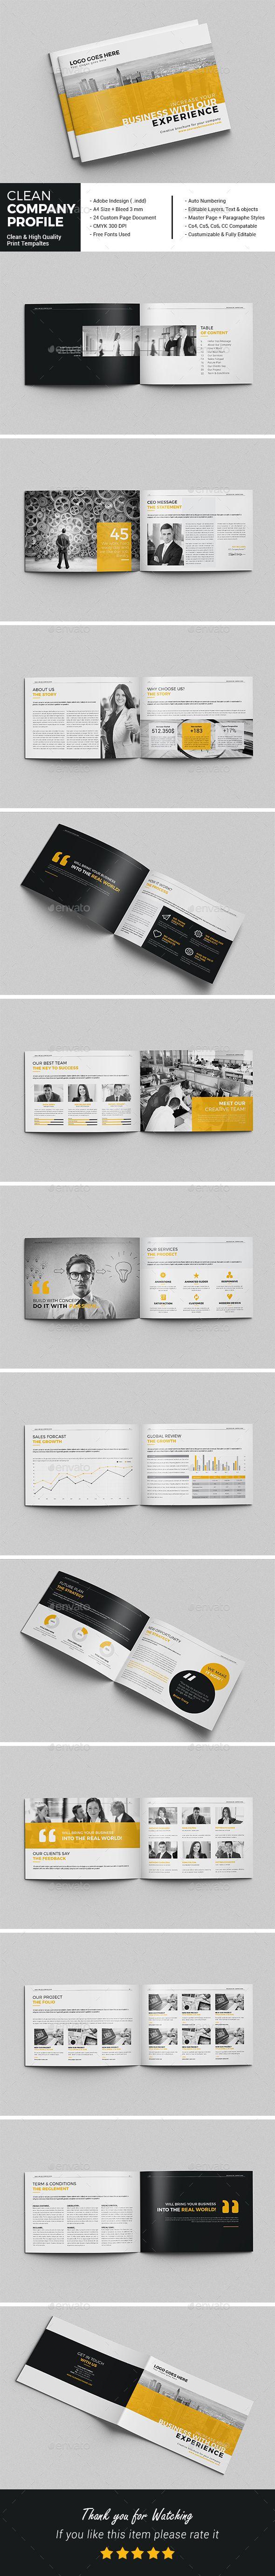 Clean Company Profile - Corporate Brochures Download here : https://graphicriver.net/item/clean-company-profile/19435870?s_rank=128&ref=Al-fatih